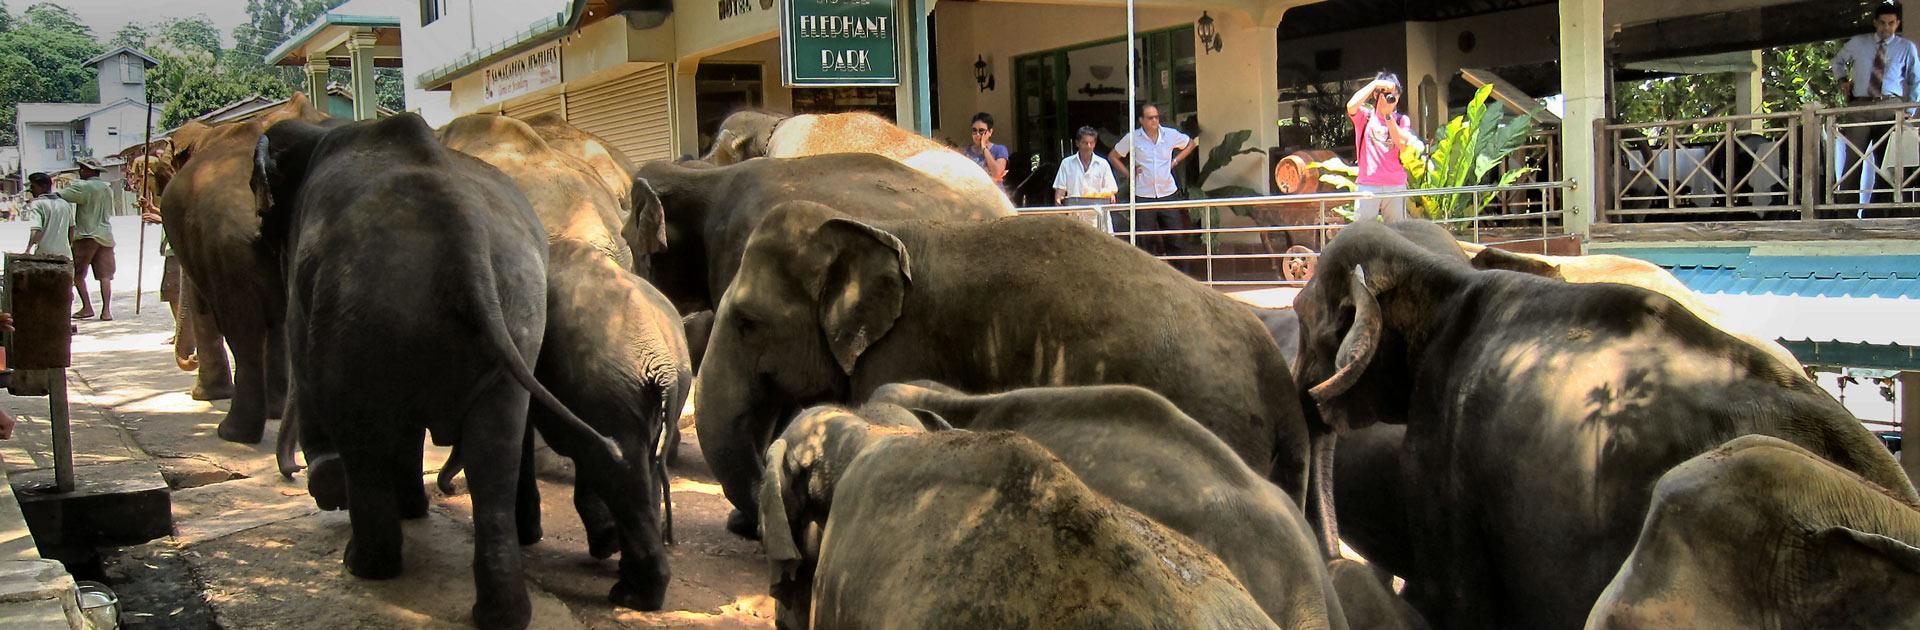 LK Top Sri Lanka y playas 9 días 3